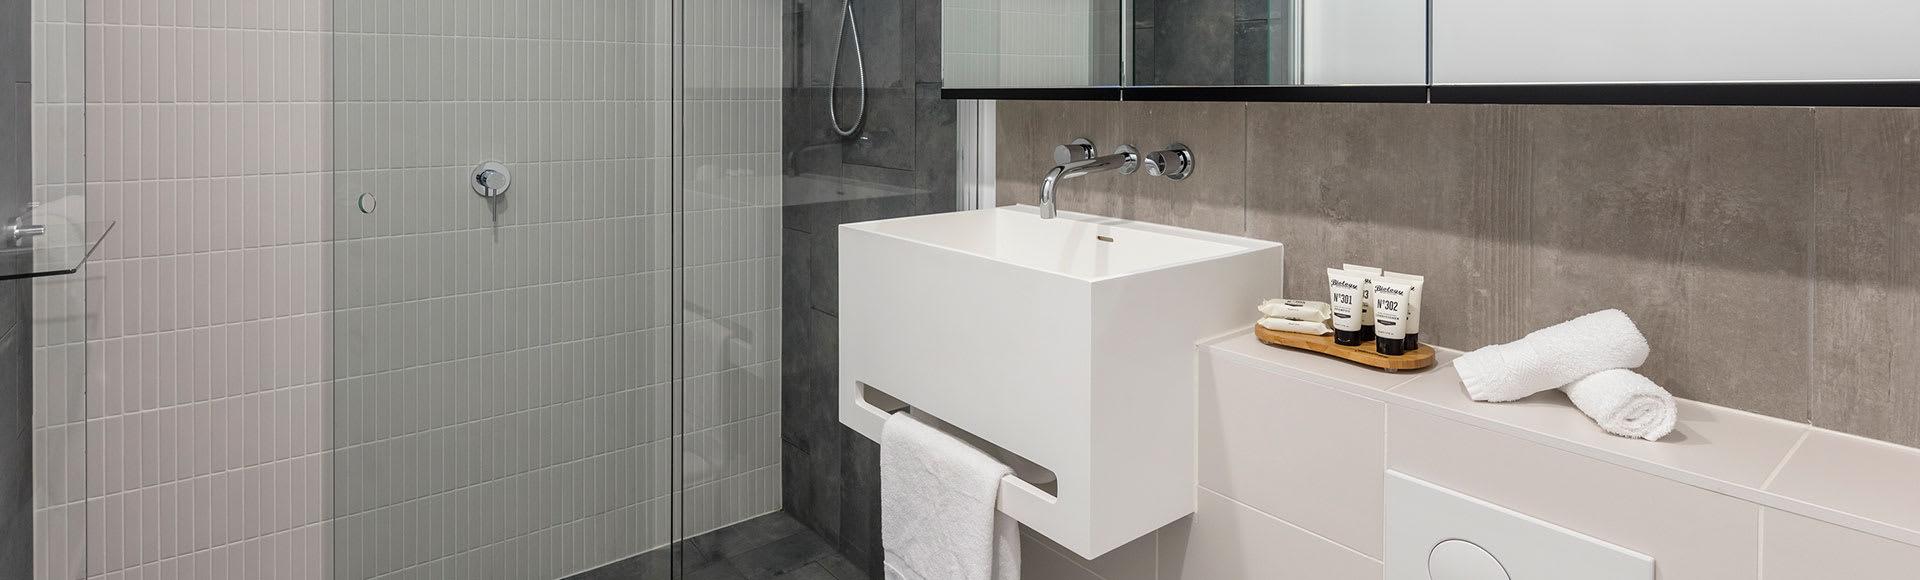 Avani Melbourne Central Residences 1 Bedroom Superior Suite Bathroom